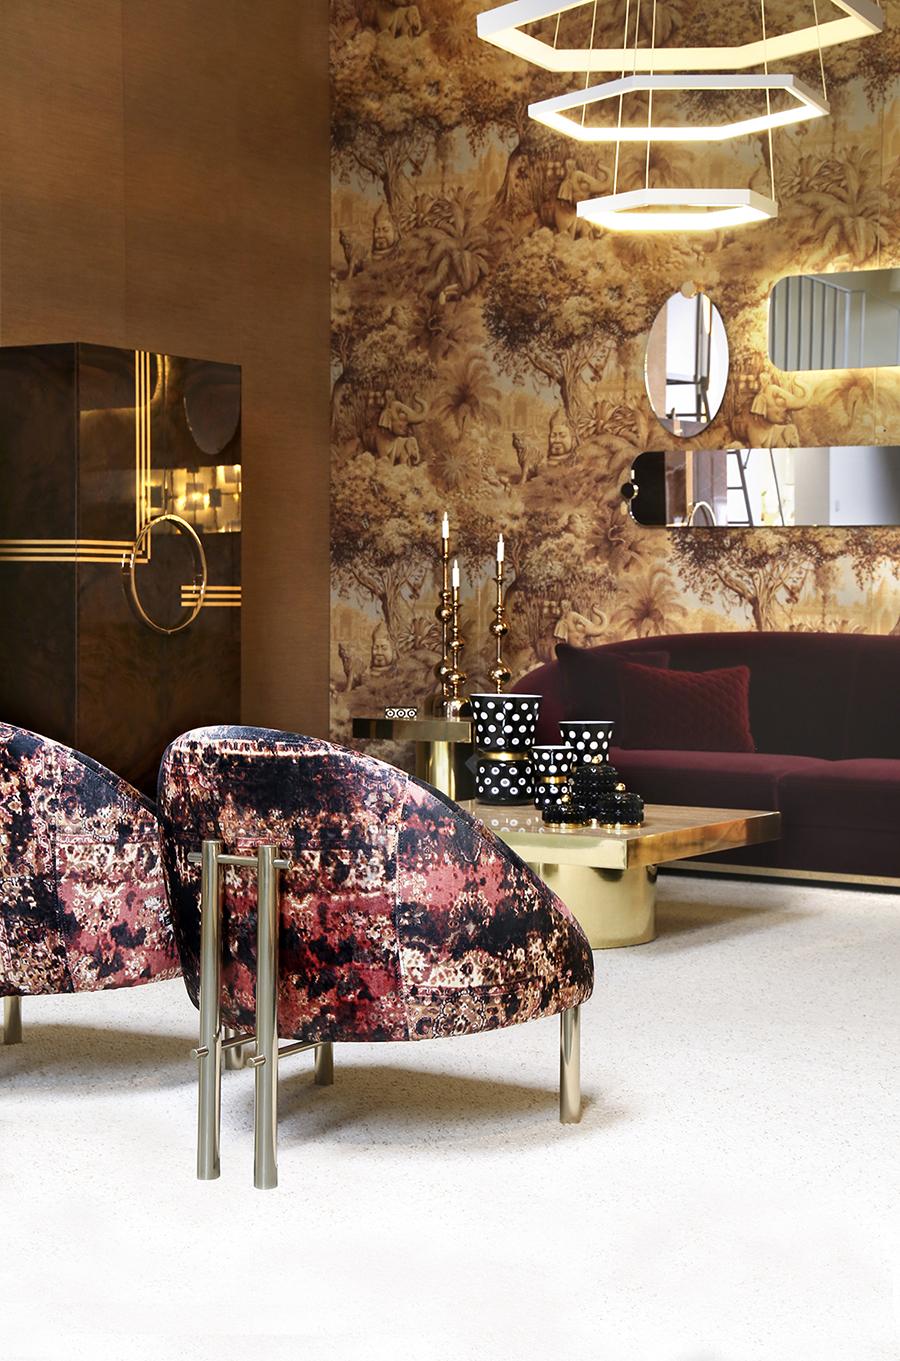 Upholstery Fabric: Next Stop Maison Et Objet 2018  Upholstery Fabric: Next Stop Maison Et Objet 2018 Ana Roque Interiors